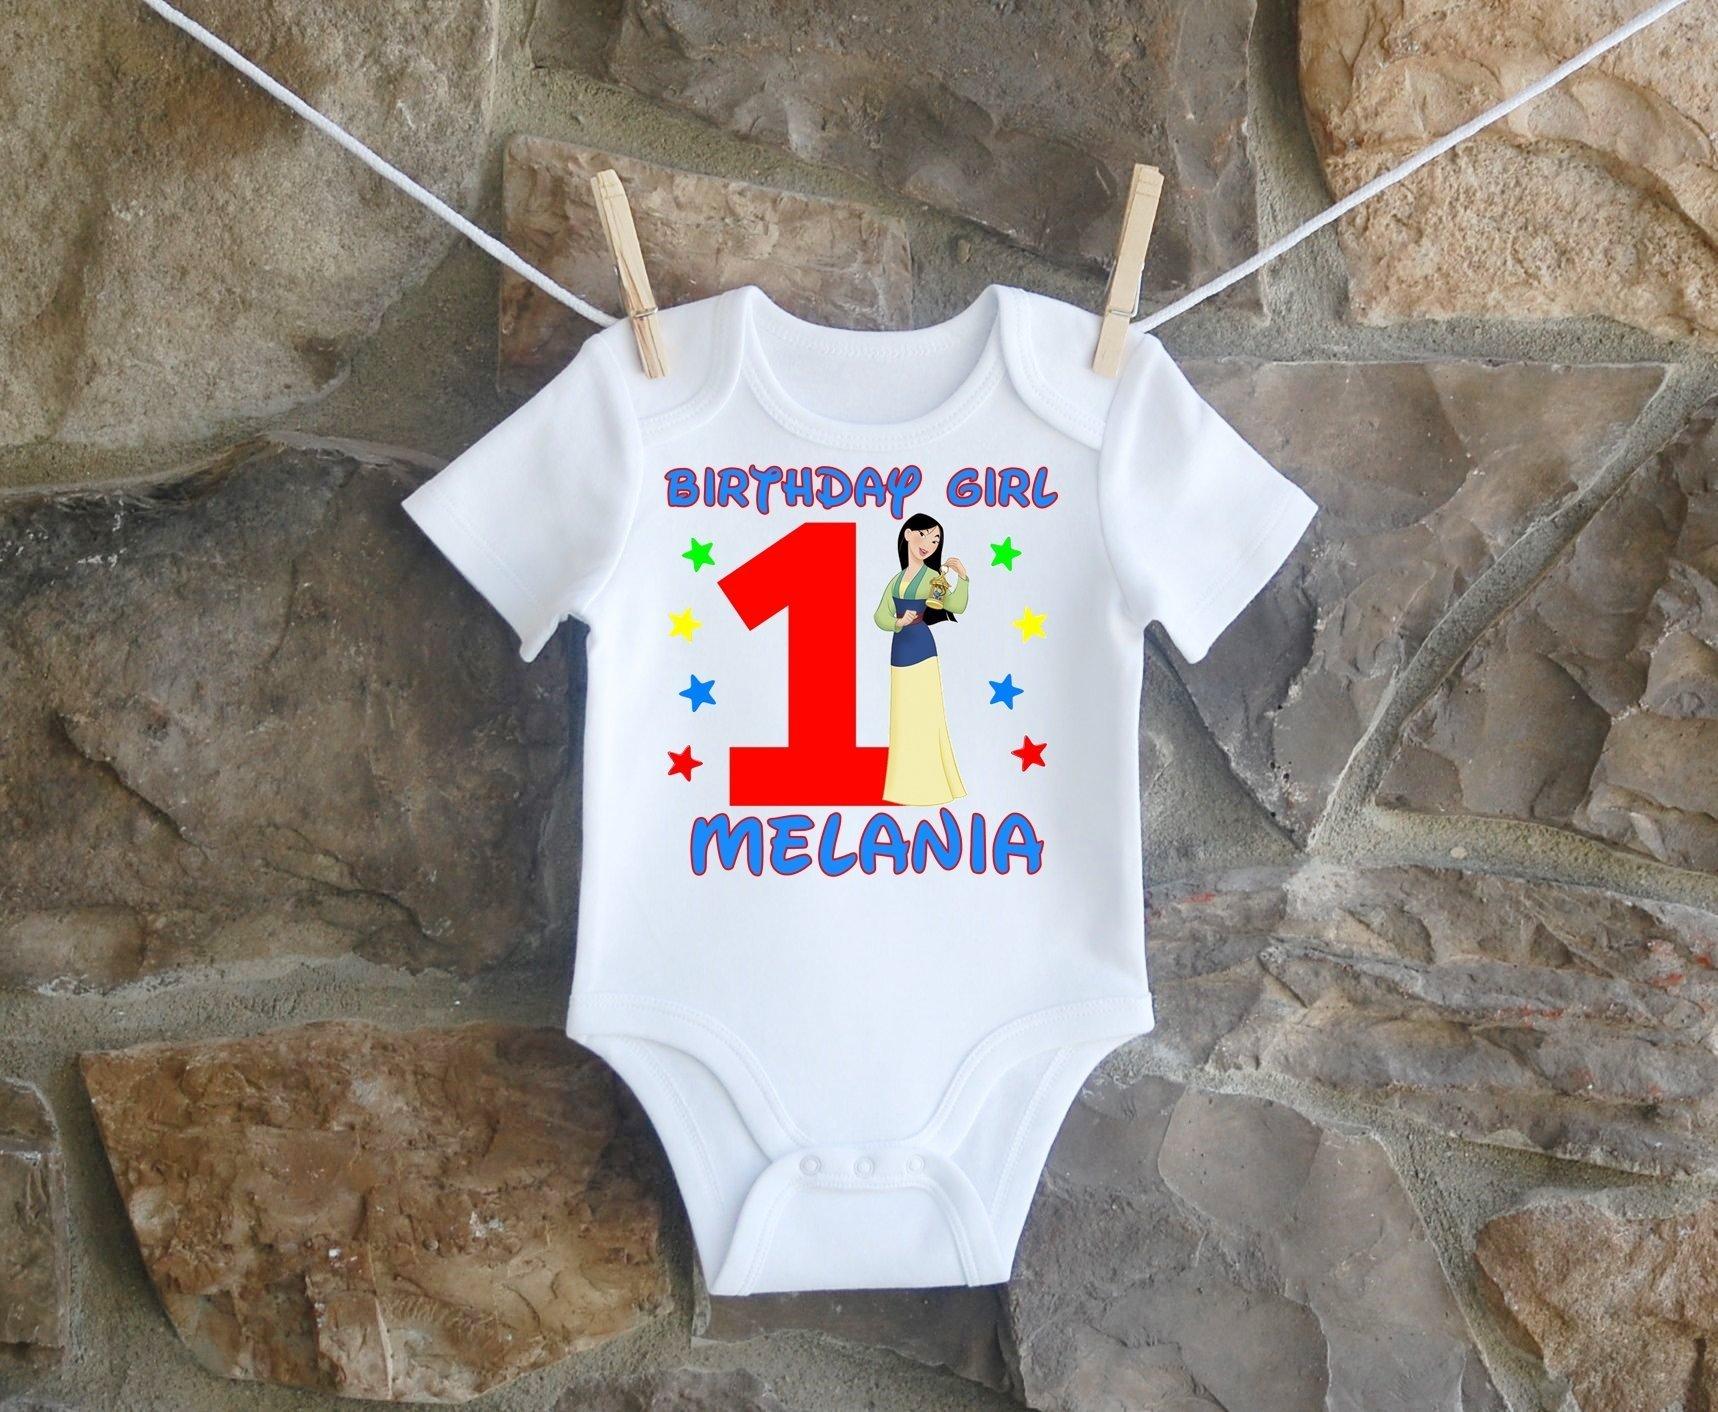 Mulan Birthday Shirt, Mulan Birthday Shirt For Girls, Personalized Girls Mulan Birthday Shirt, Customized Mulan Birthday Shirt